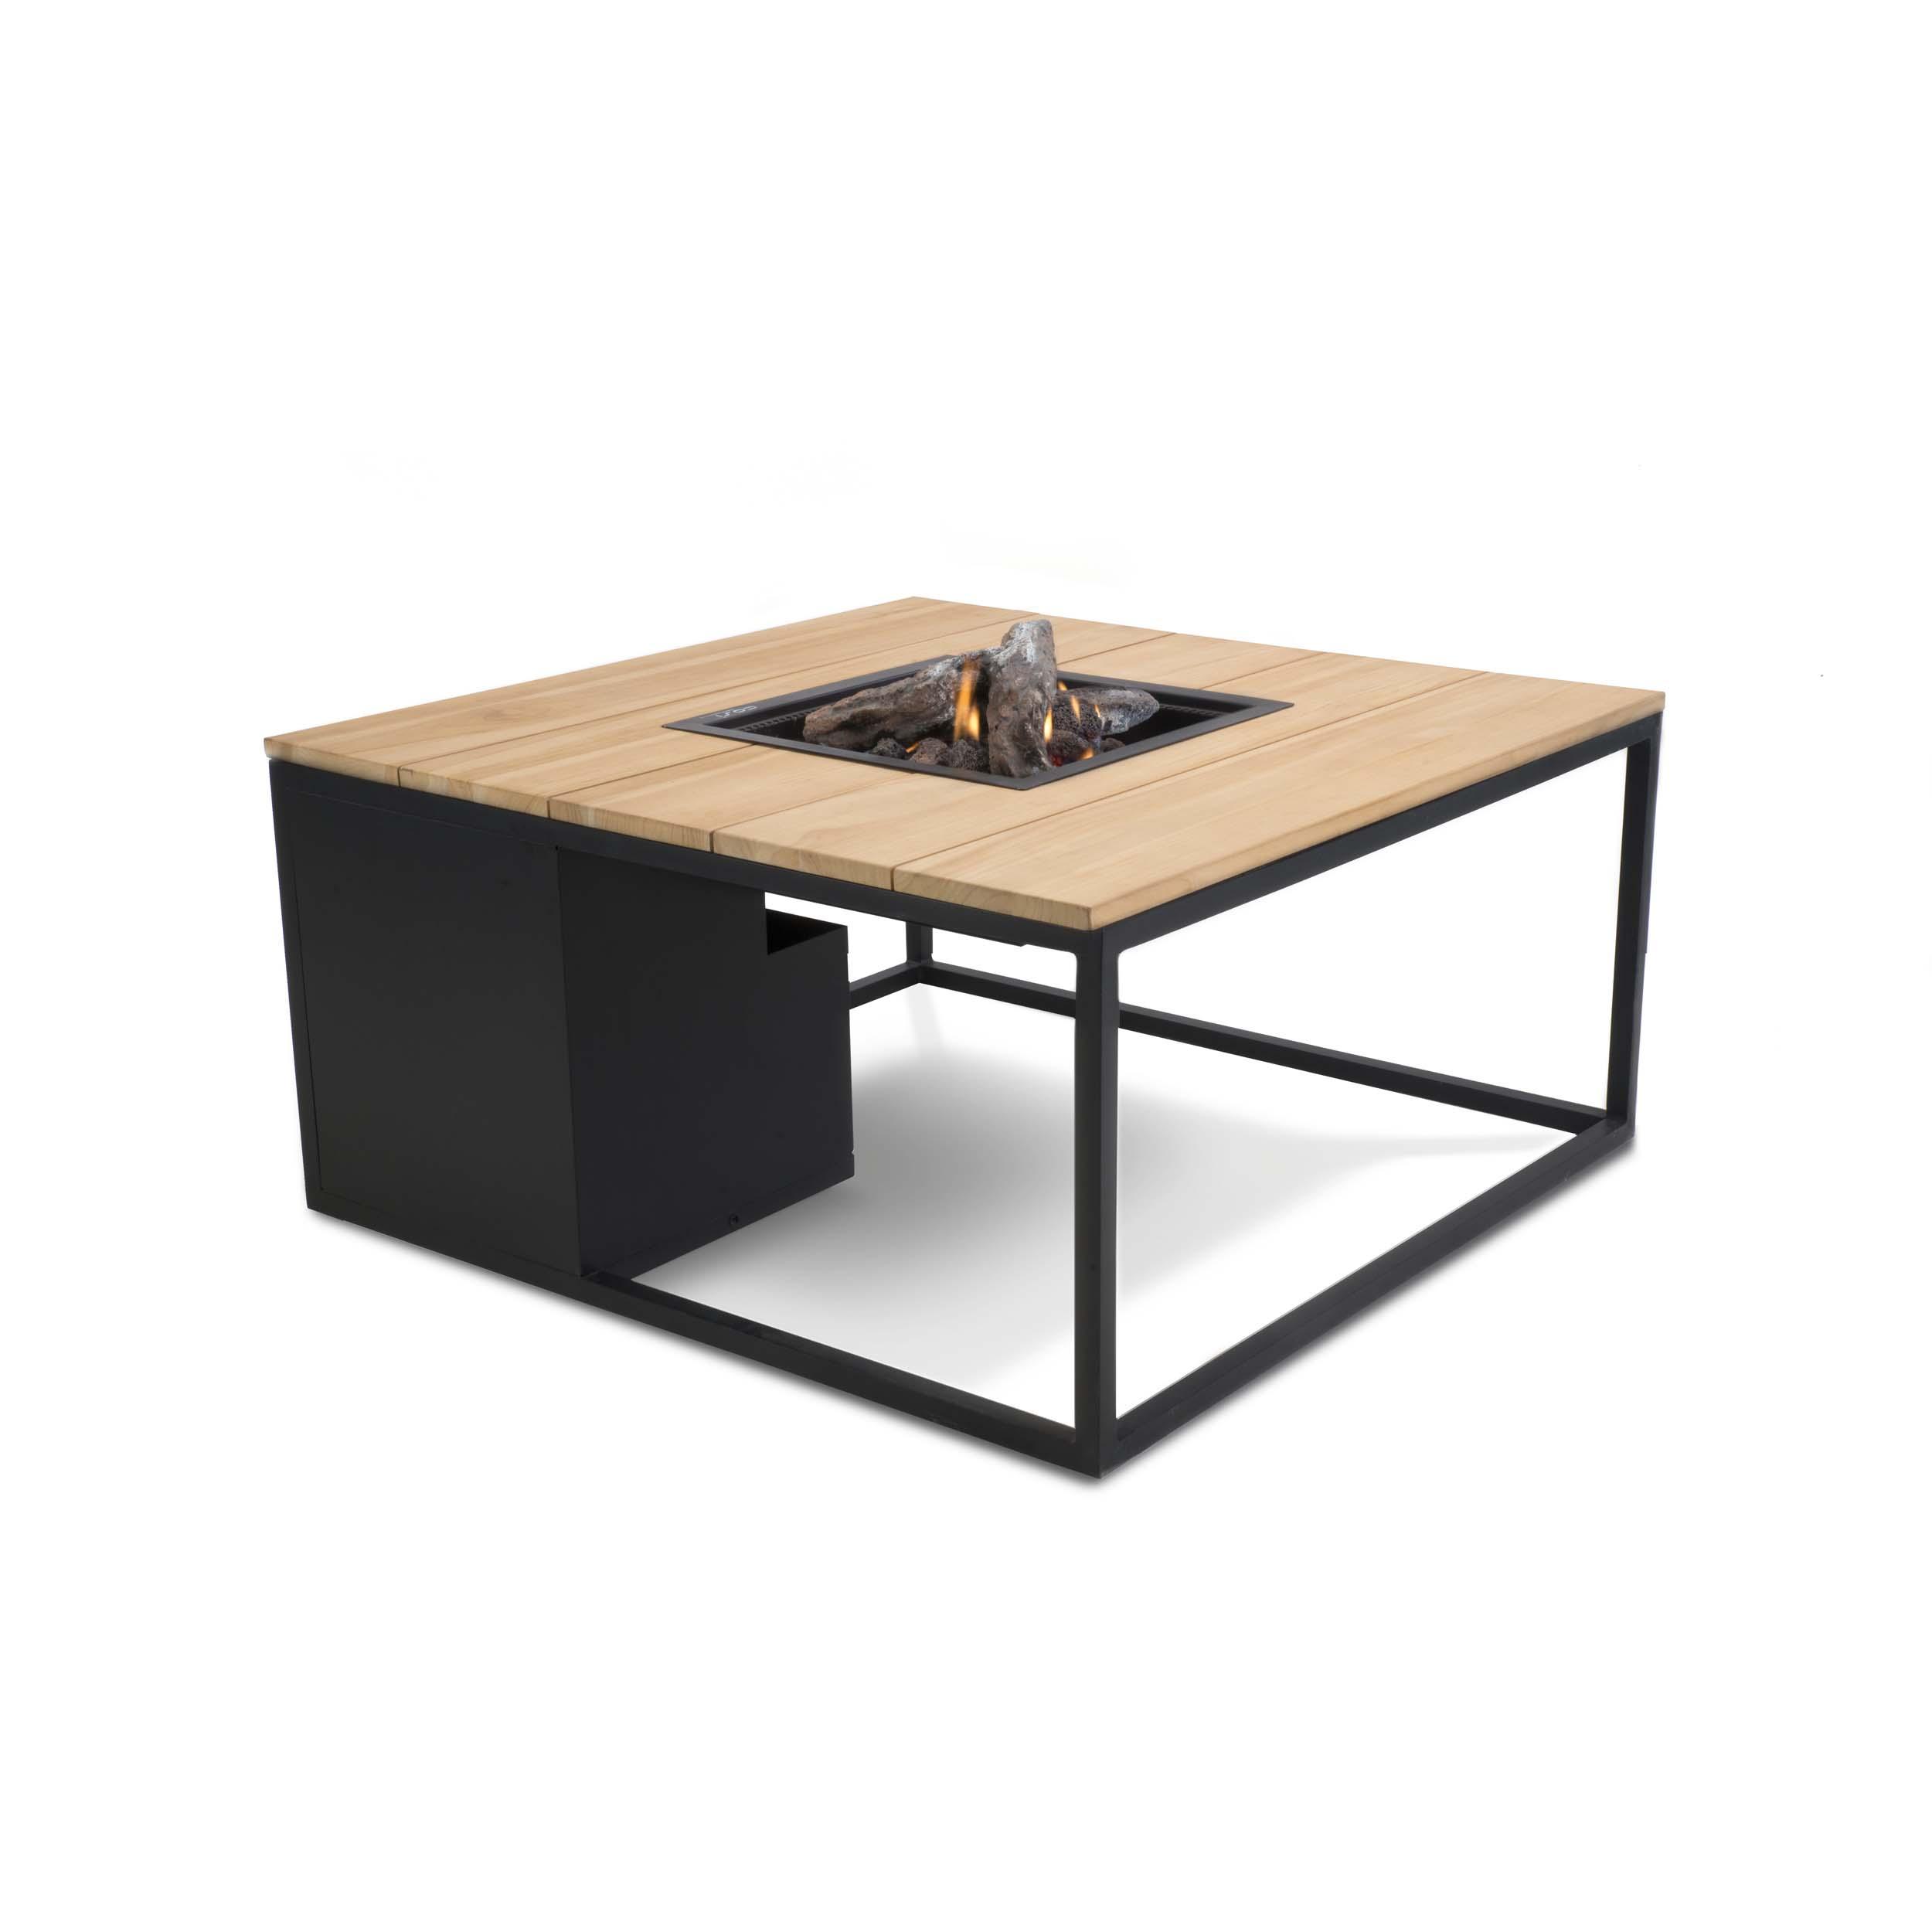 Cosiloft loungebord med gasbrænder – 100x100x47 – sort/teak